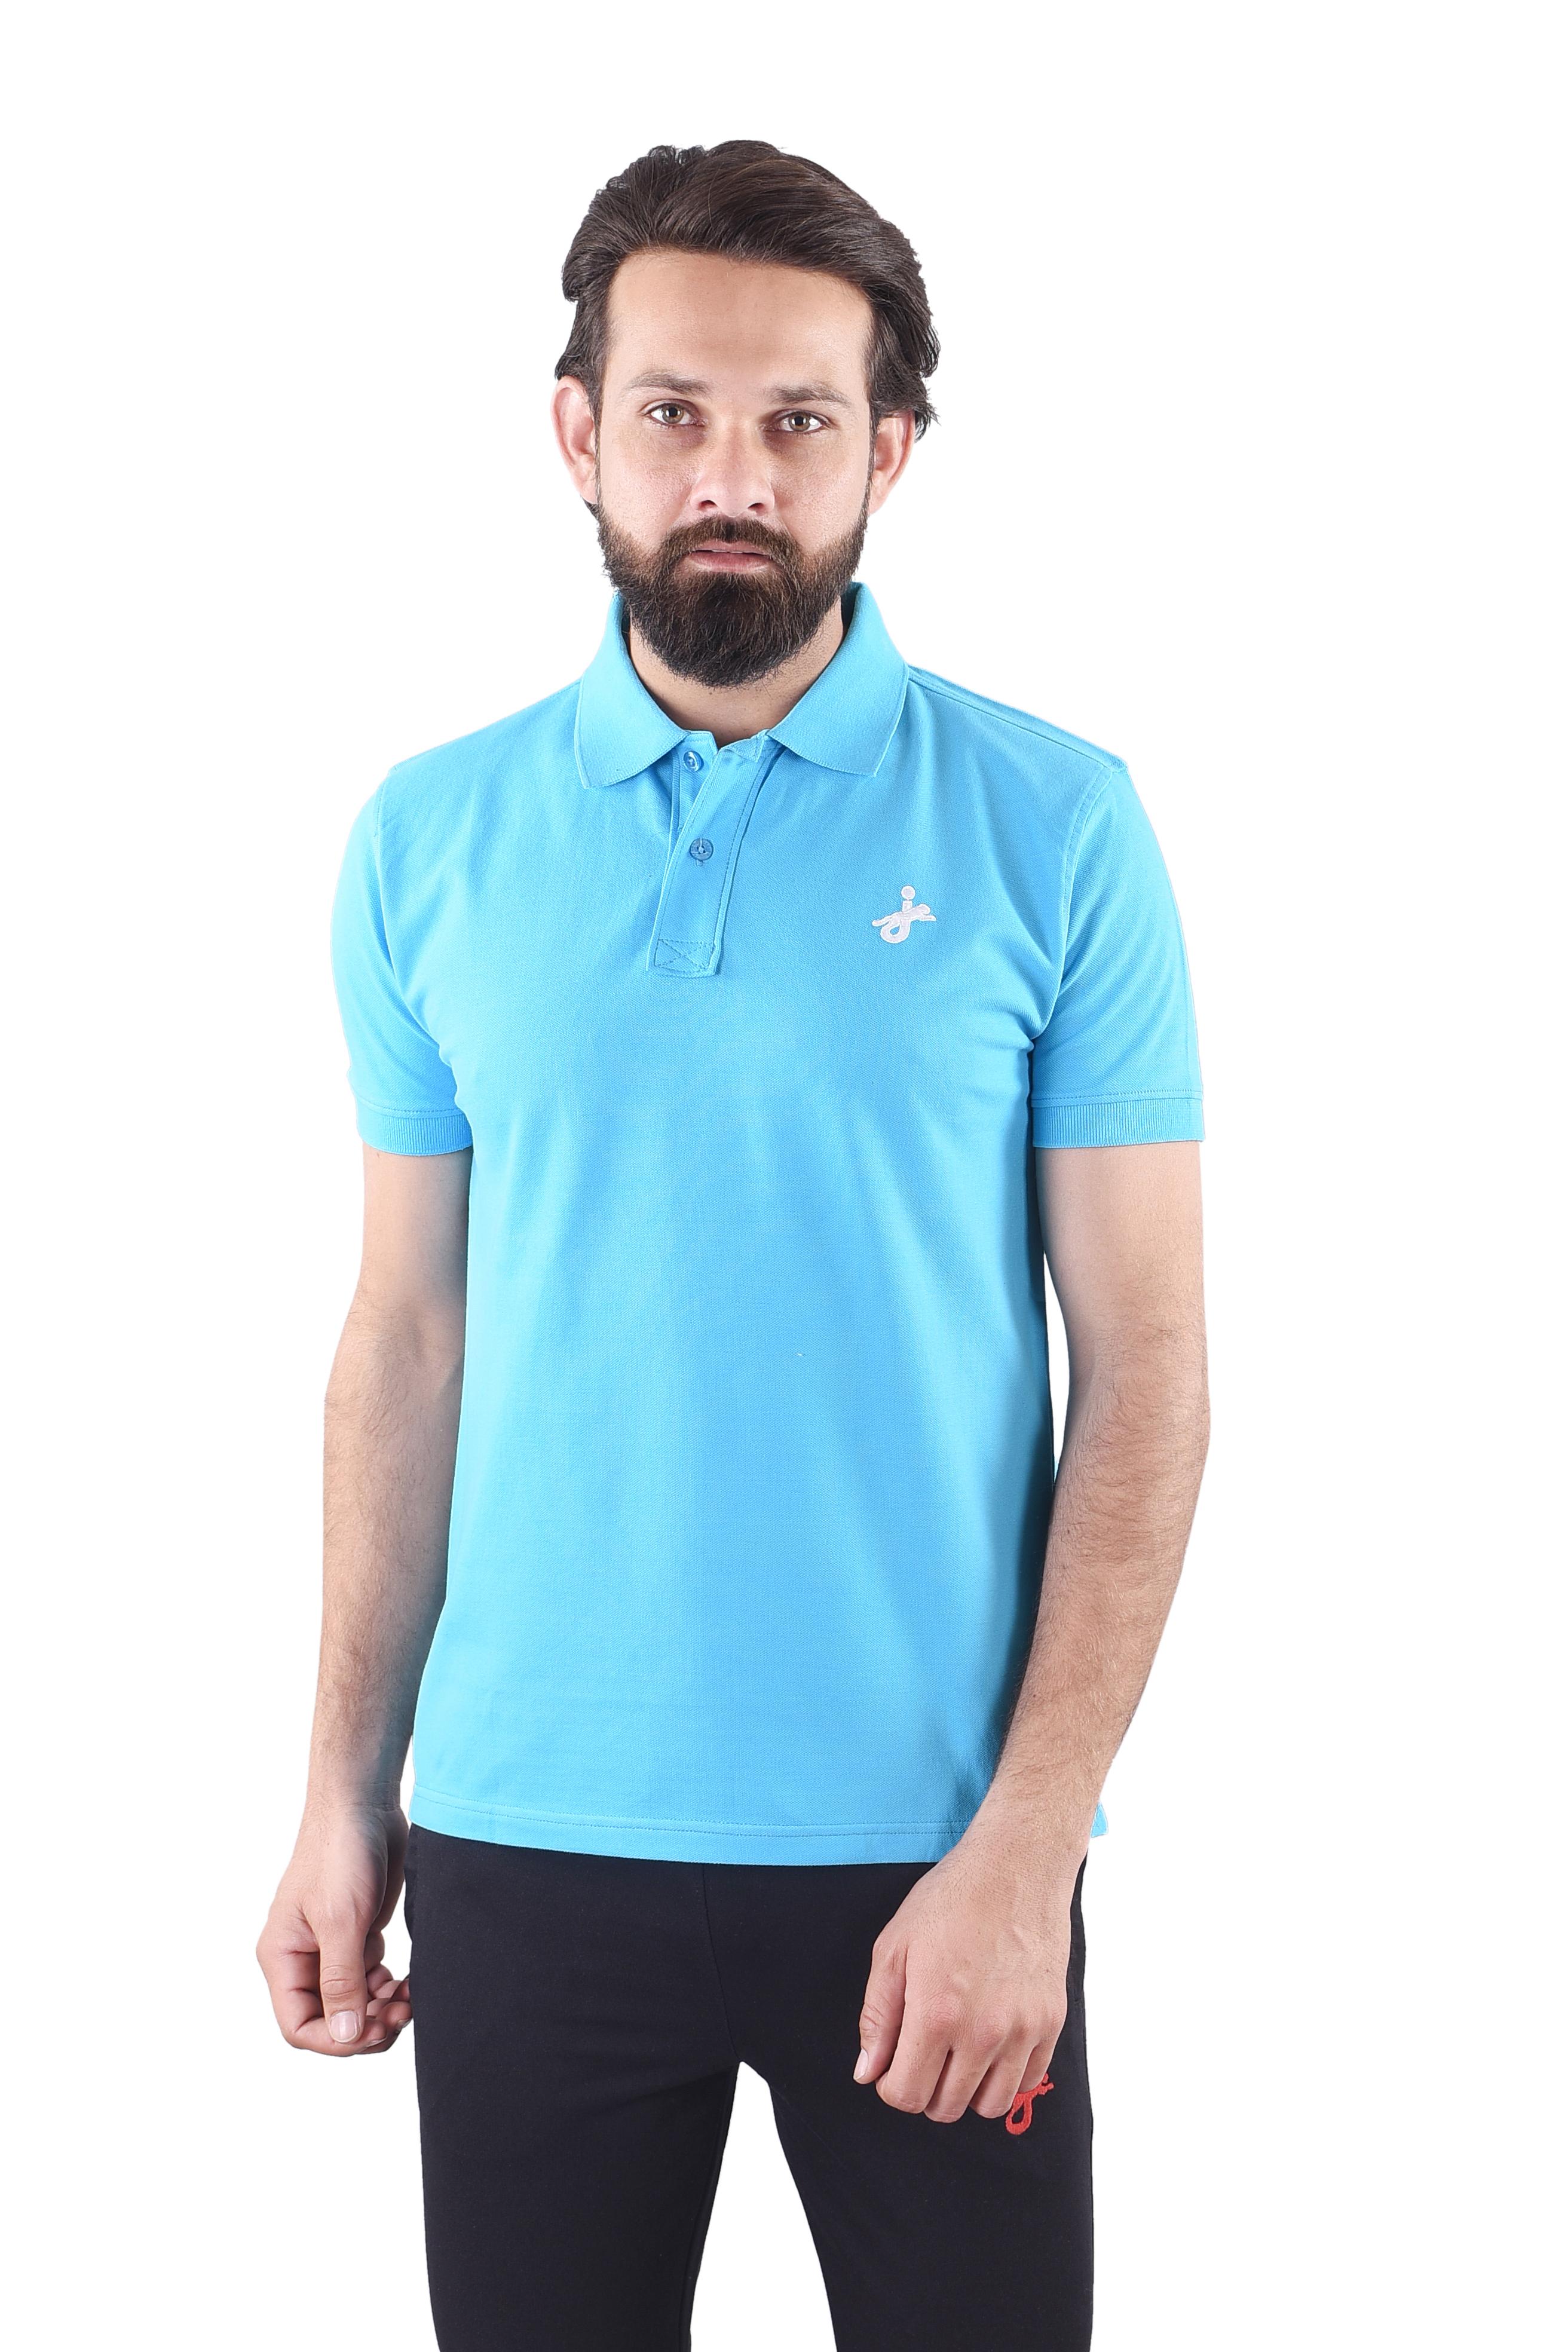 JAGURO   JAGURO  Men's Cotton Solid Polo Collar  T-Shirt.